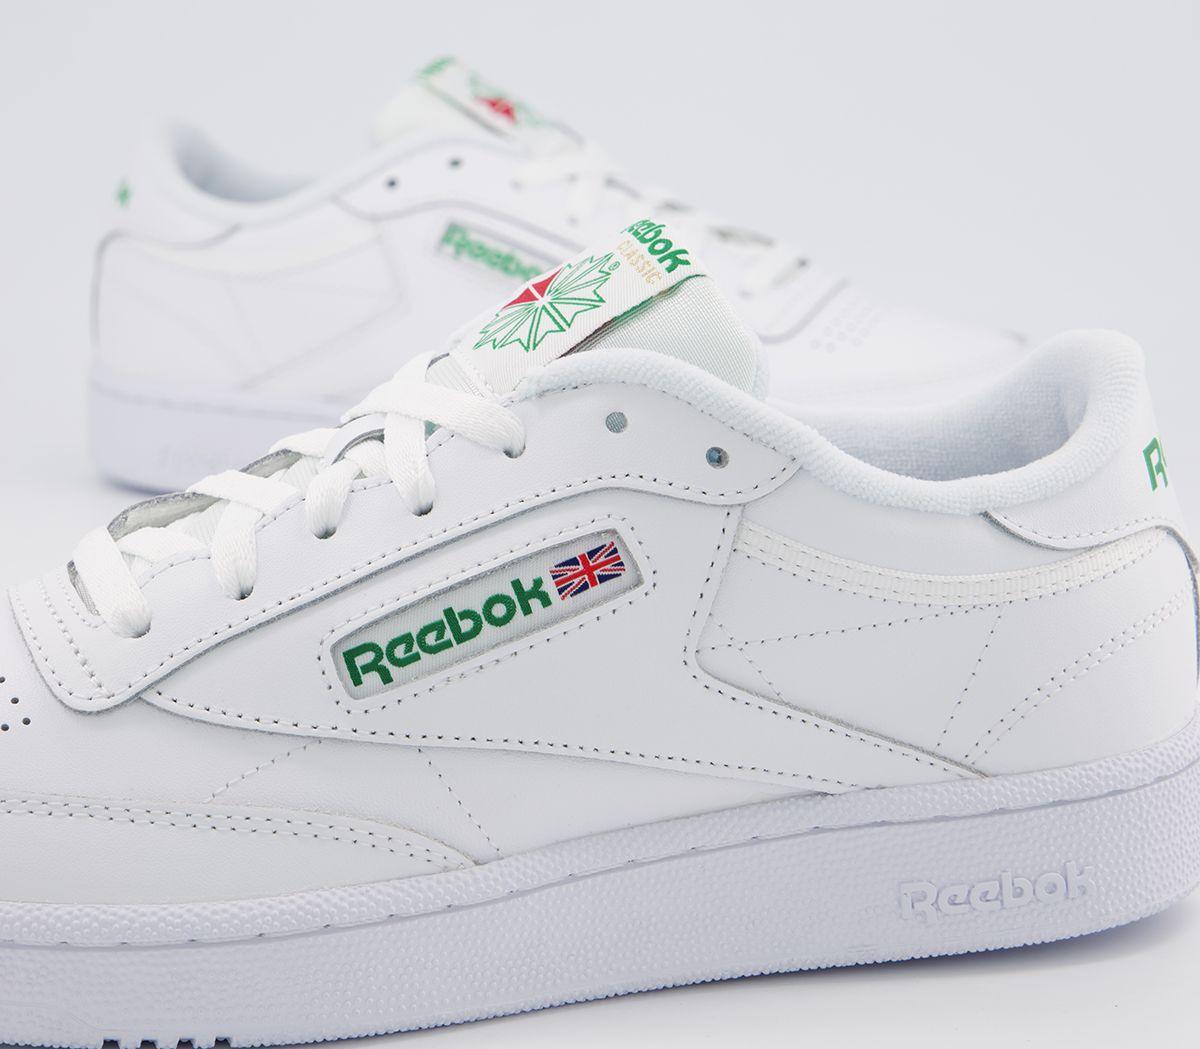 a46c597b6 Sentinel Reebok Club C 85 White Green Trainers Shoes